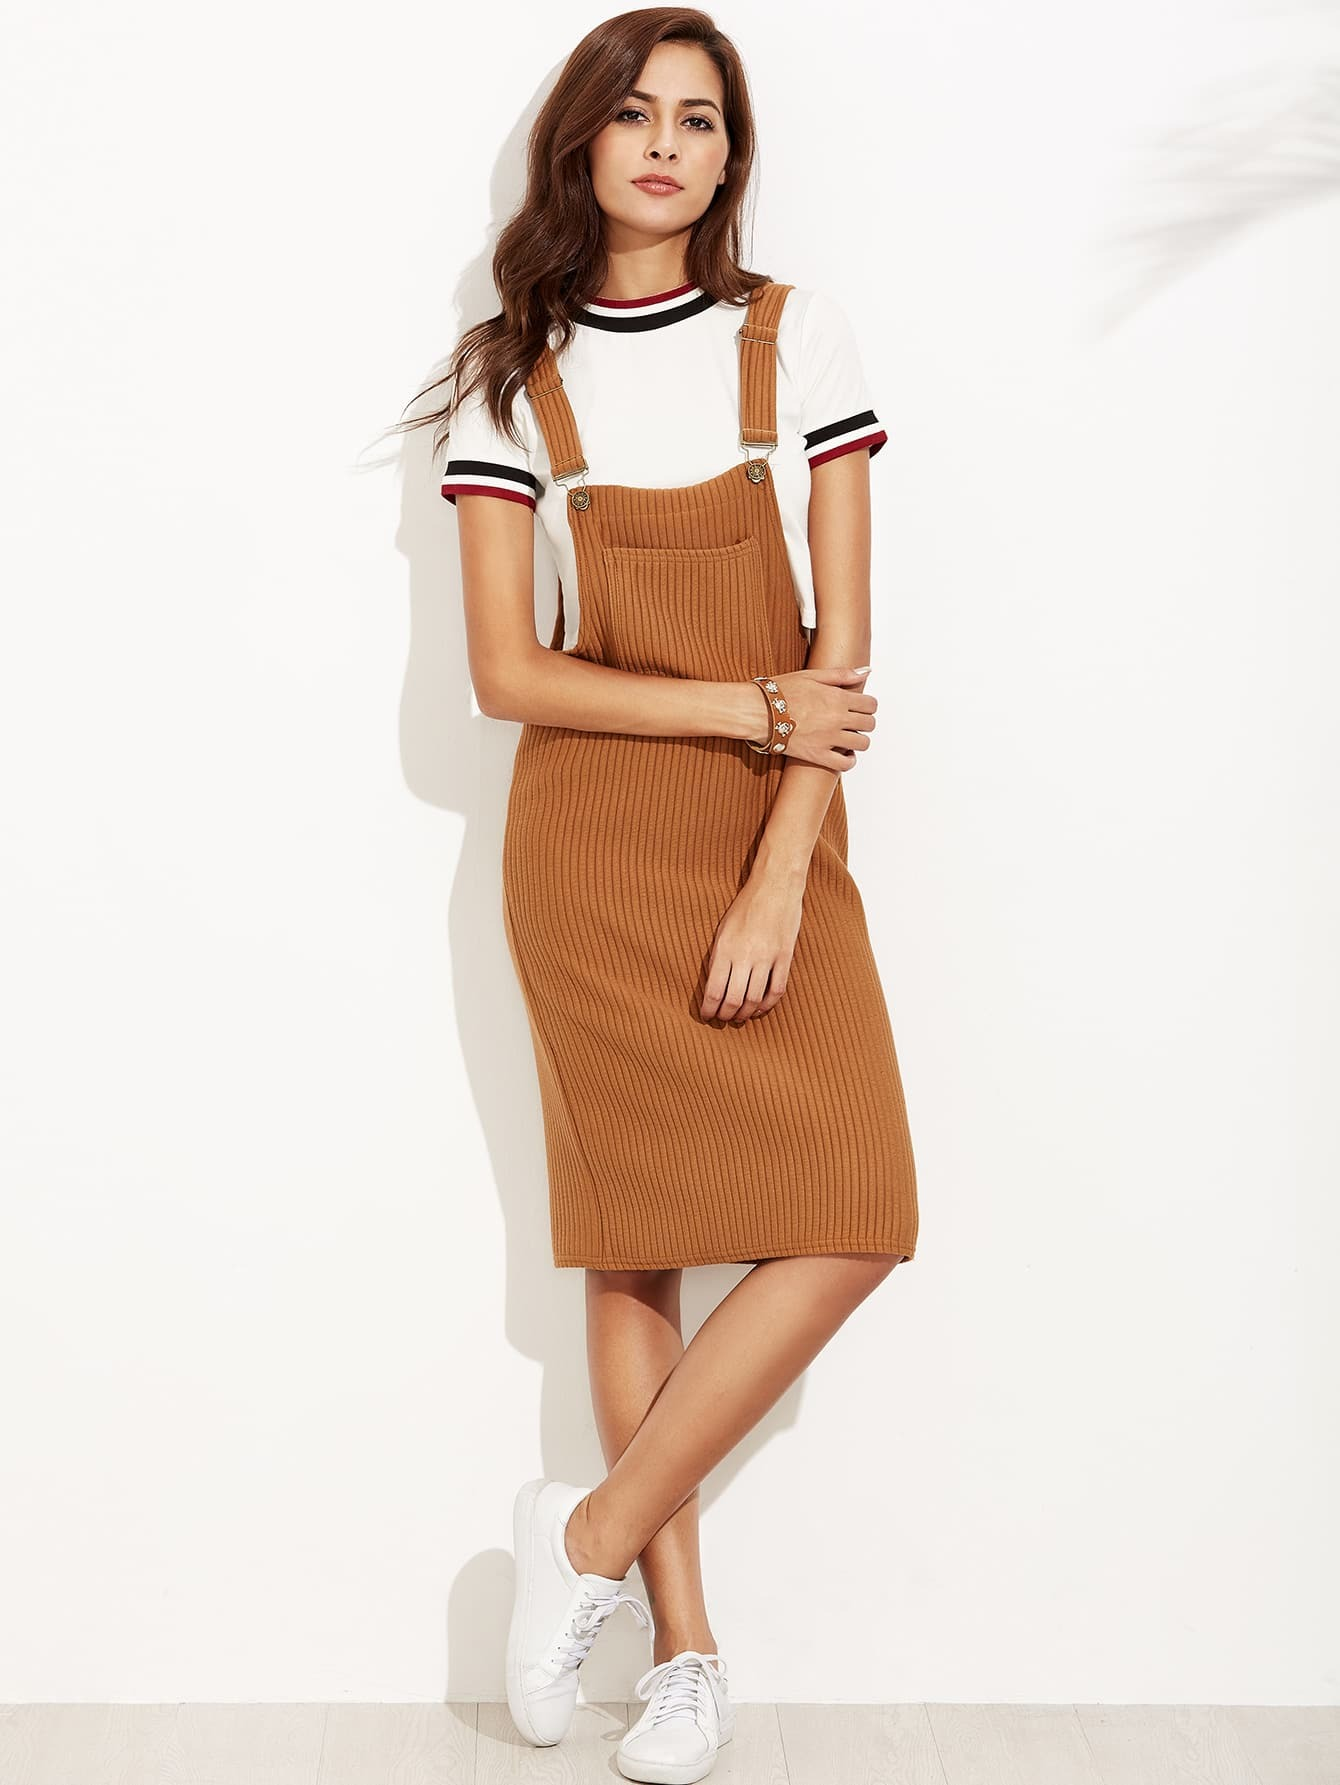 Khaki Ribbed Overall Dress With Pockets dress160817122